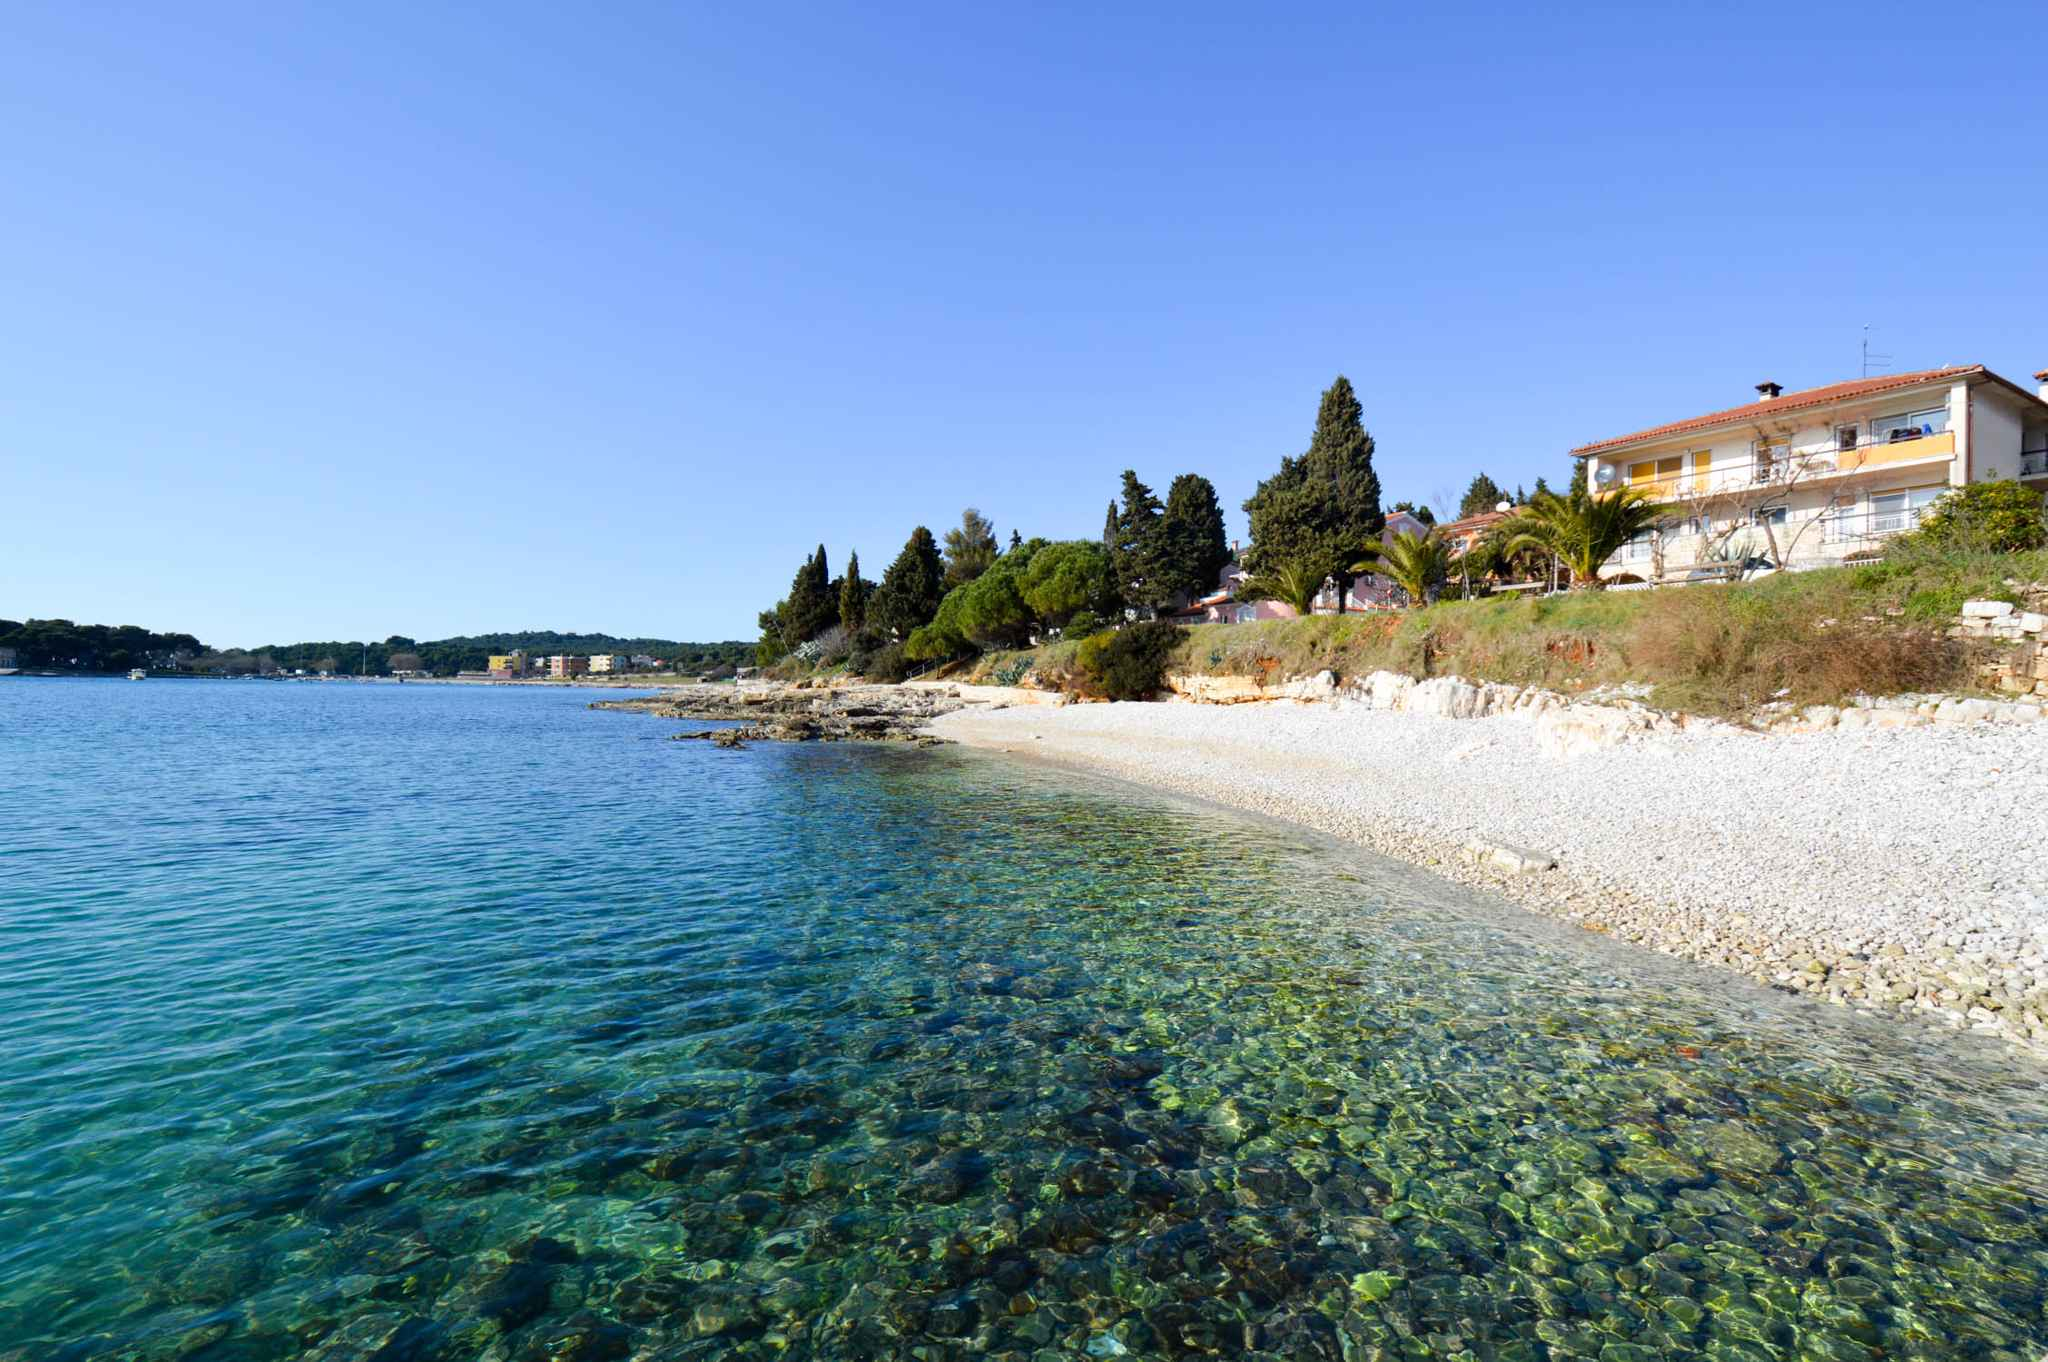 Ferienwohnung direkt am Meer gelegen (280674), Pula, , Istrien, Kroatien, Bild 5